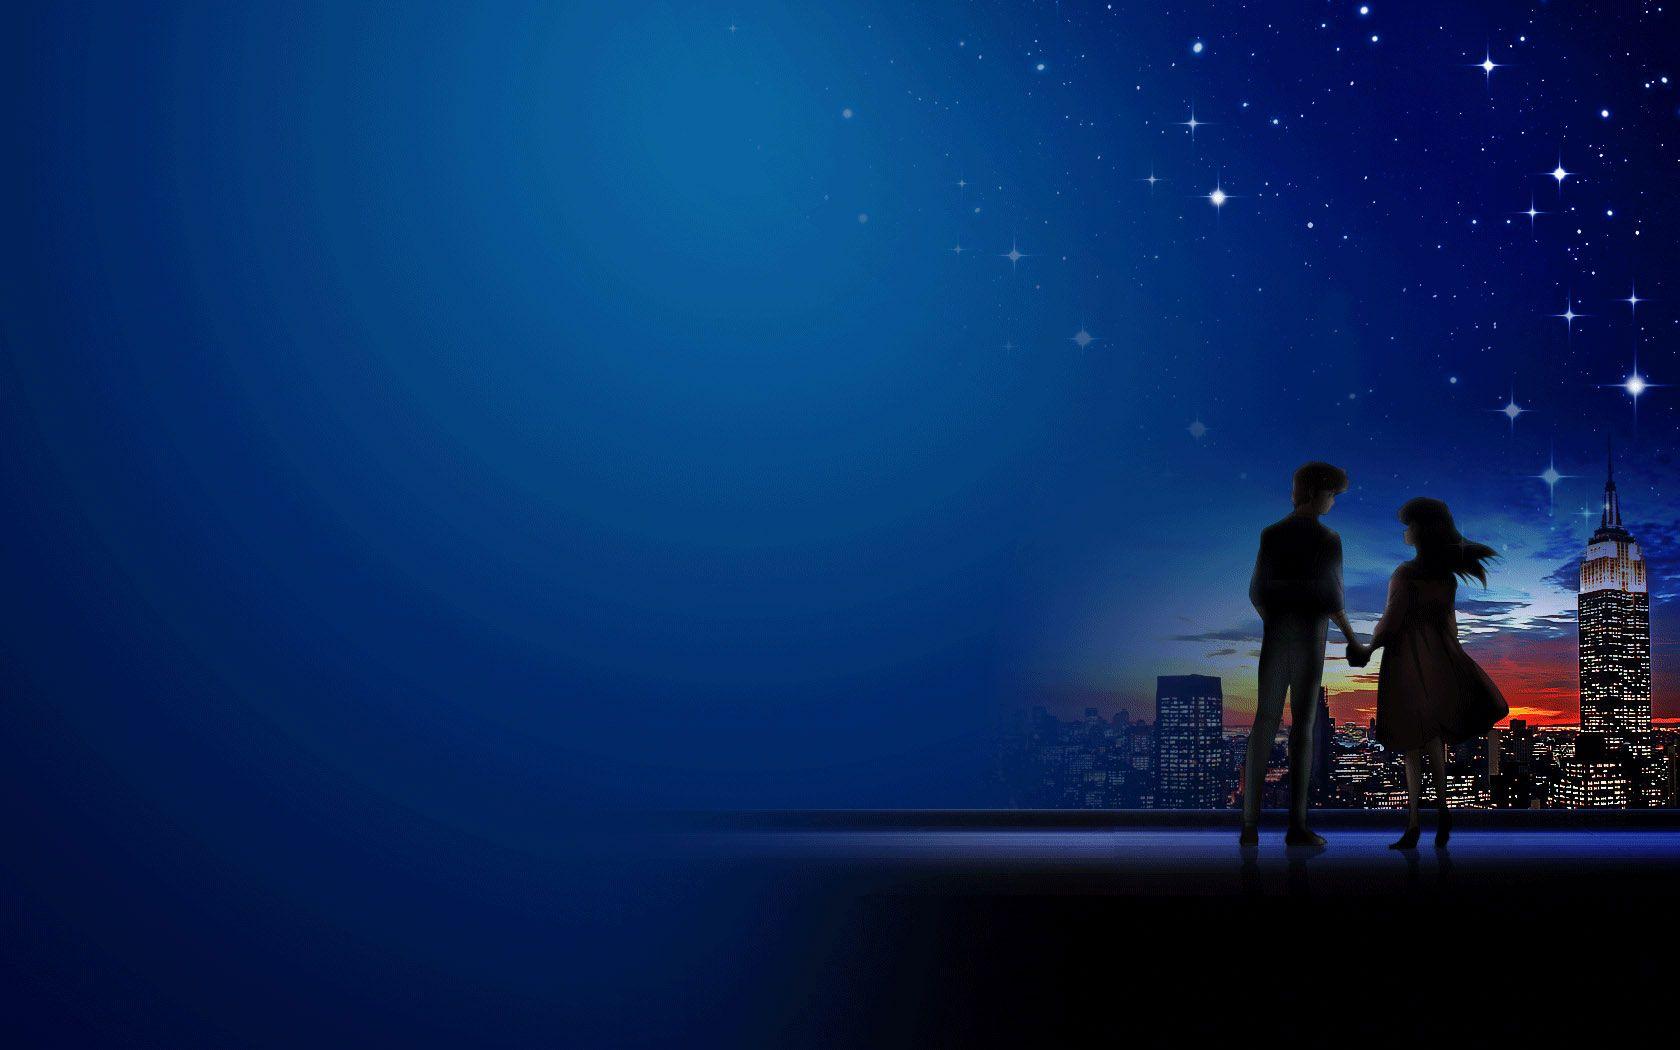 Romantic Couples Anime WallpapersLoveRomantic Wallpapers